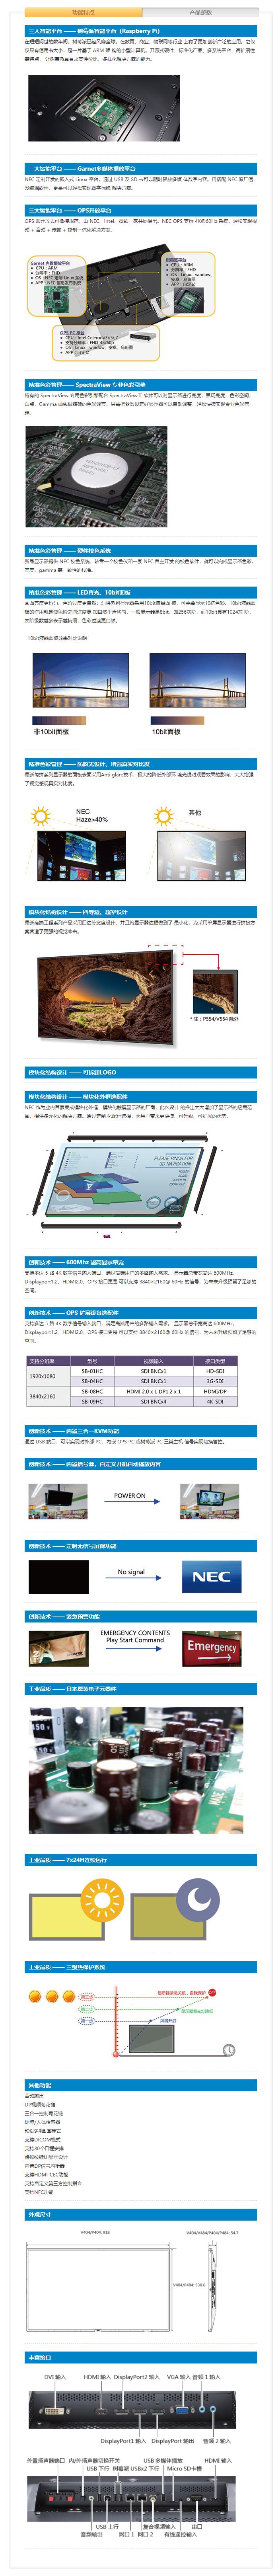 NEC显示器_产品_V404